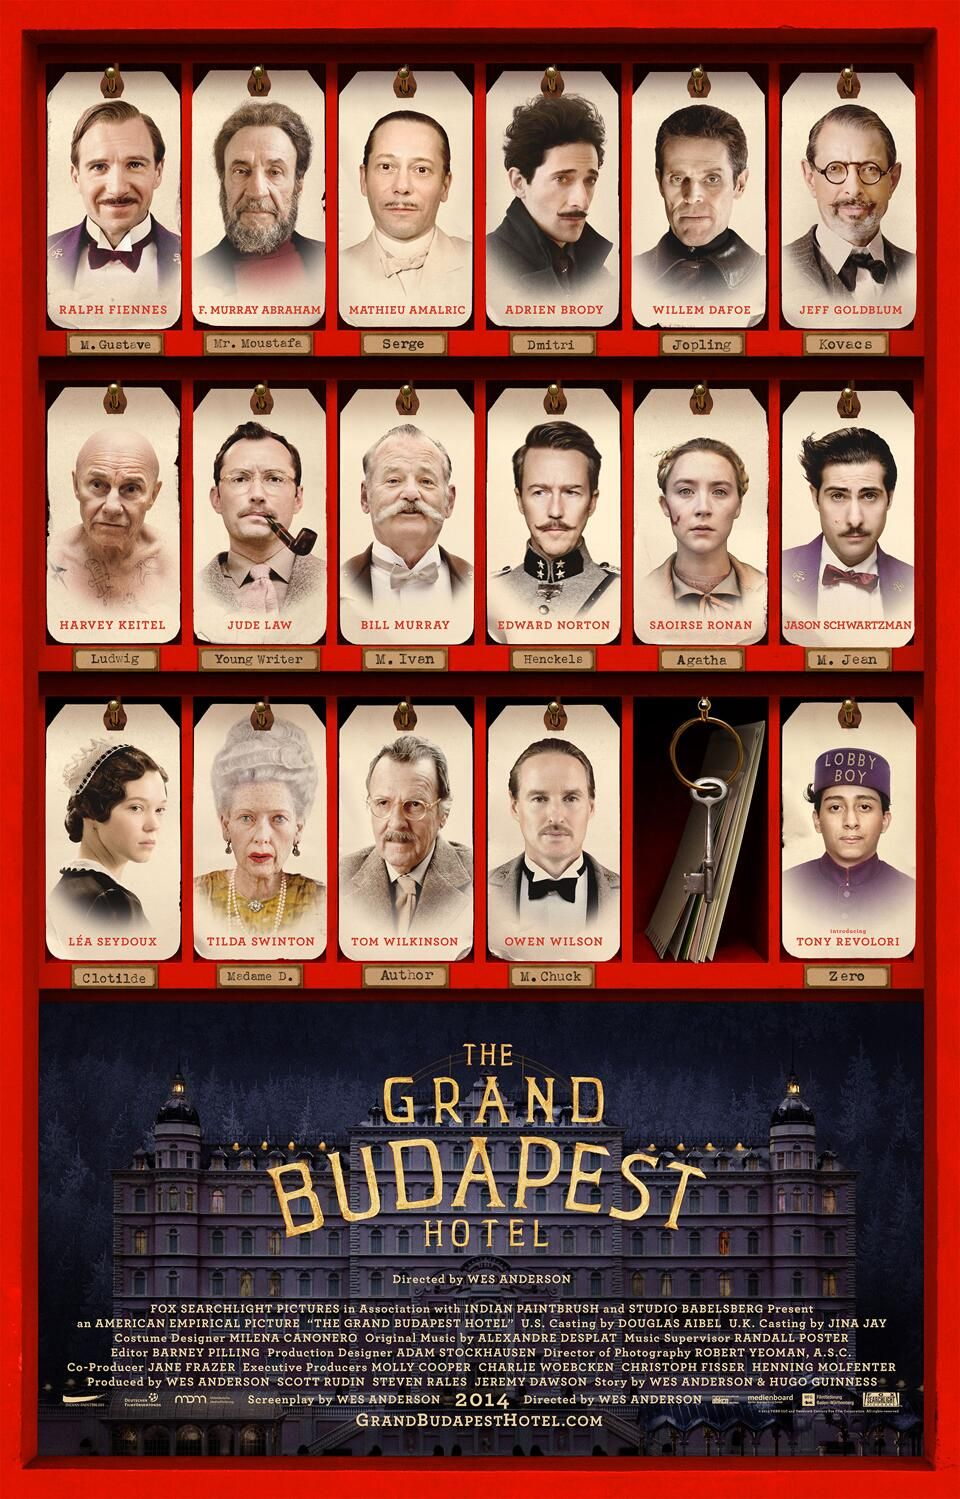 Jeff Goldblum Talks Grand Budapest Hotel And Mortdecai